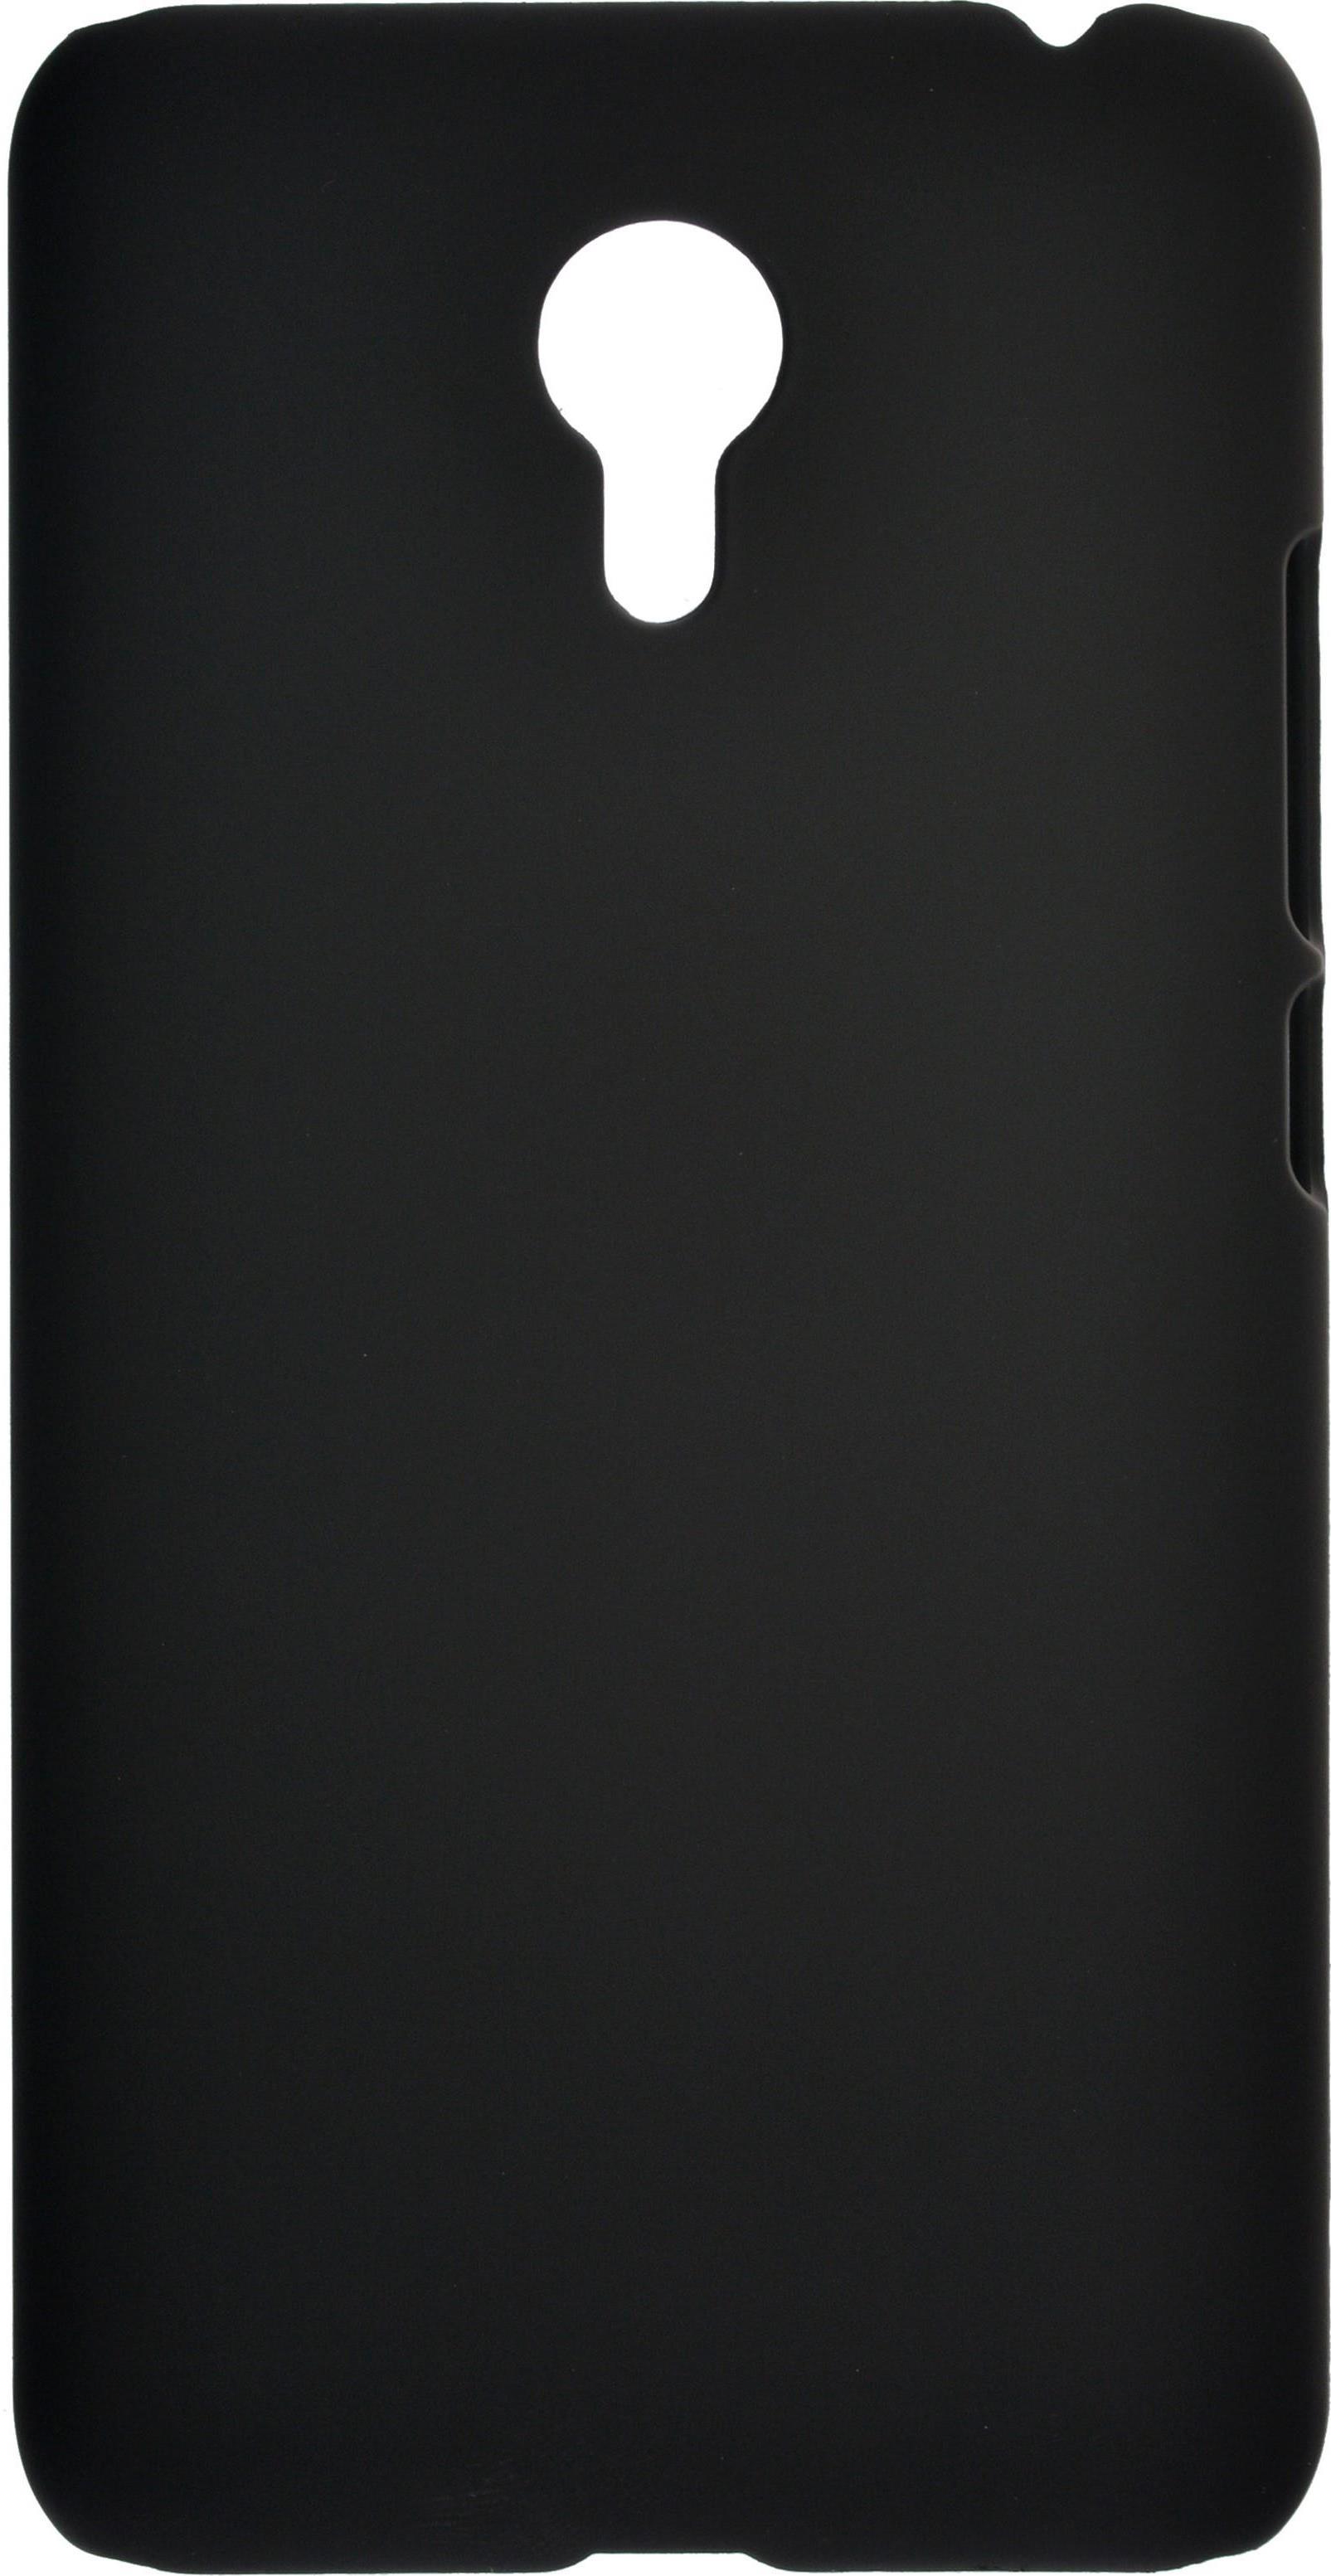 Чехол SkinBox 4People для Meizu M2 Mini, черный